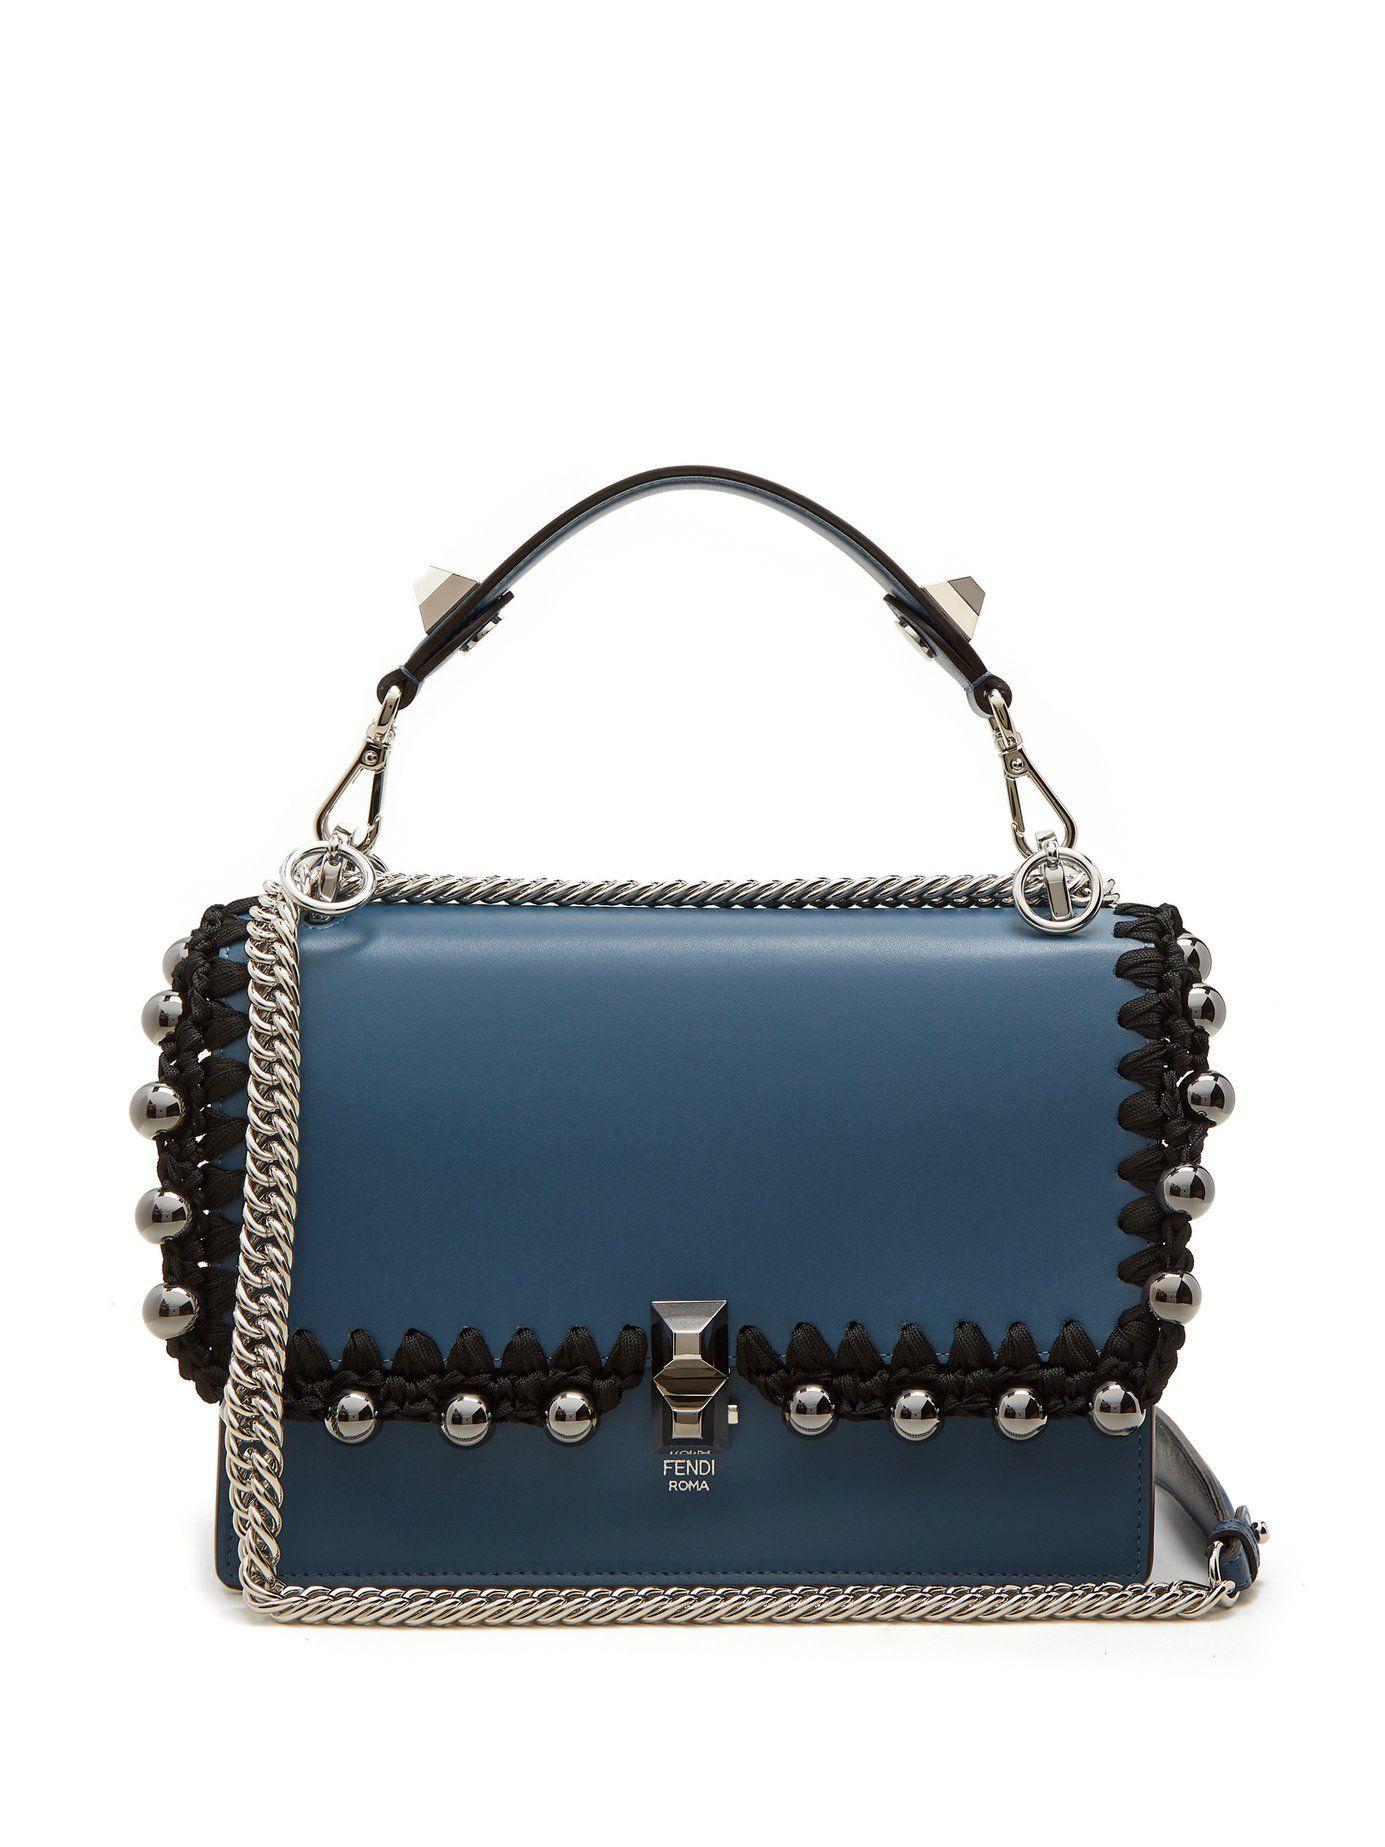 93fa9883dfb5 Kan I leather shoulder bag | Fendi | MATCHESFASHION.COm Shared by Career  Path Design